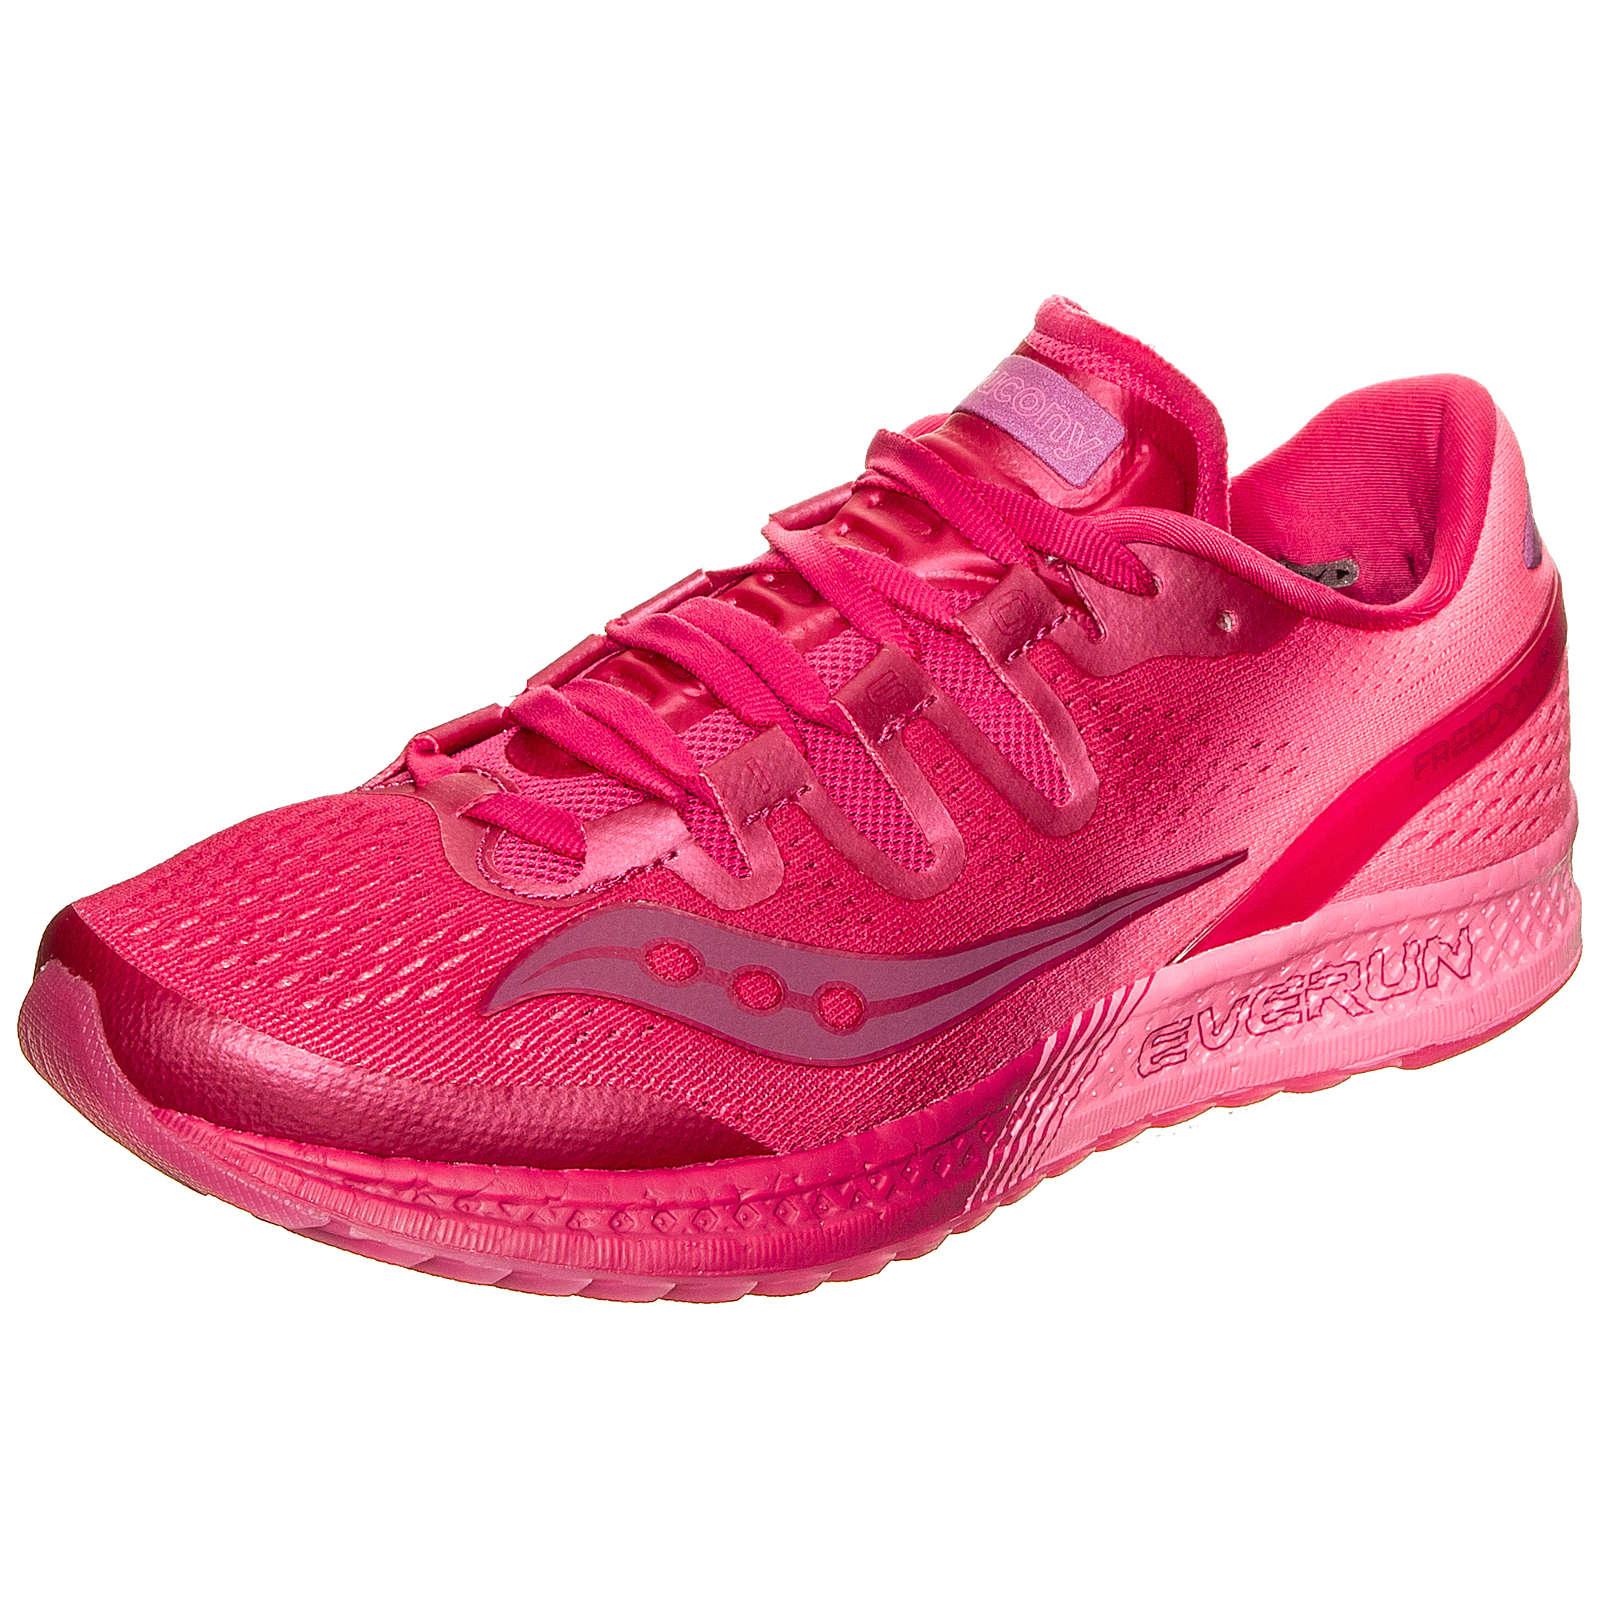 Saucony Freedom ISO Laufschuhe pink Damen Gr. 38